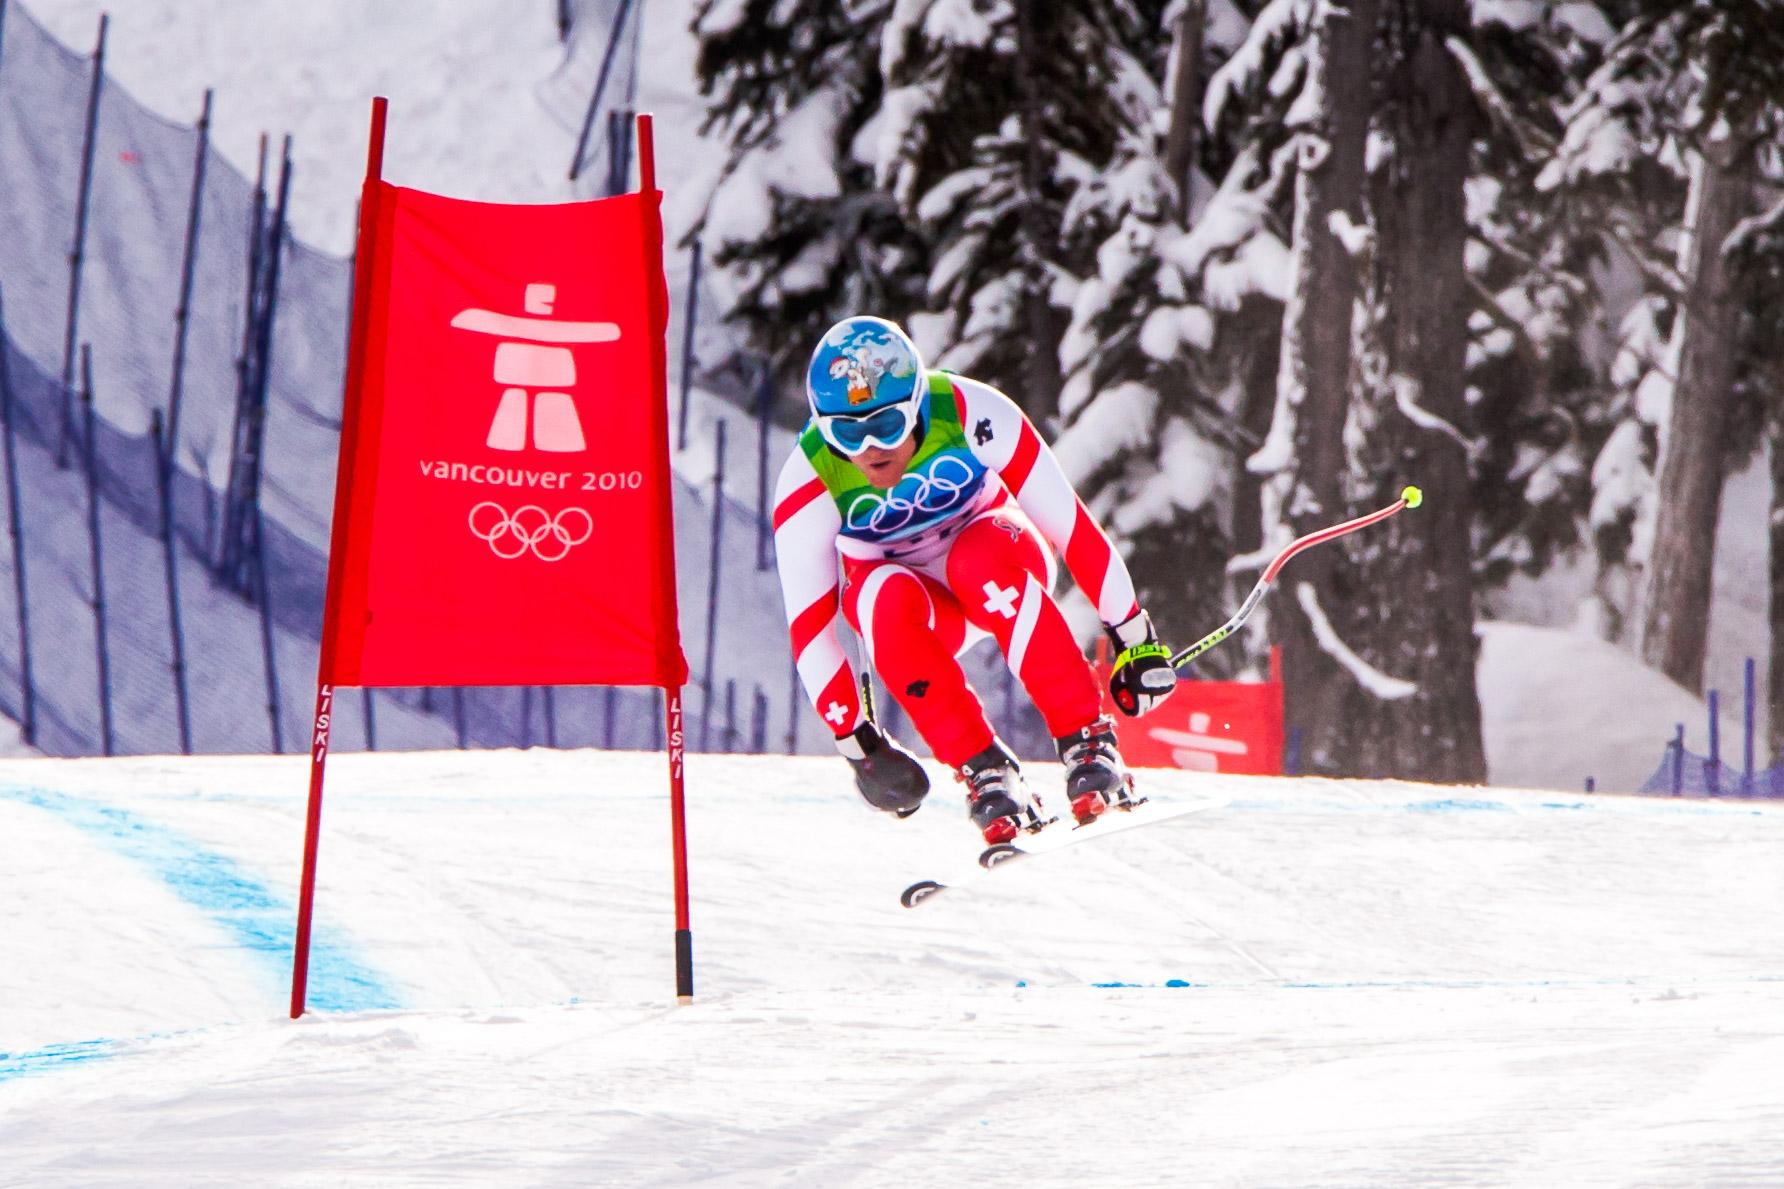 Justa-Jeskova-sport-events-photography-JJ006659.jpg